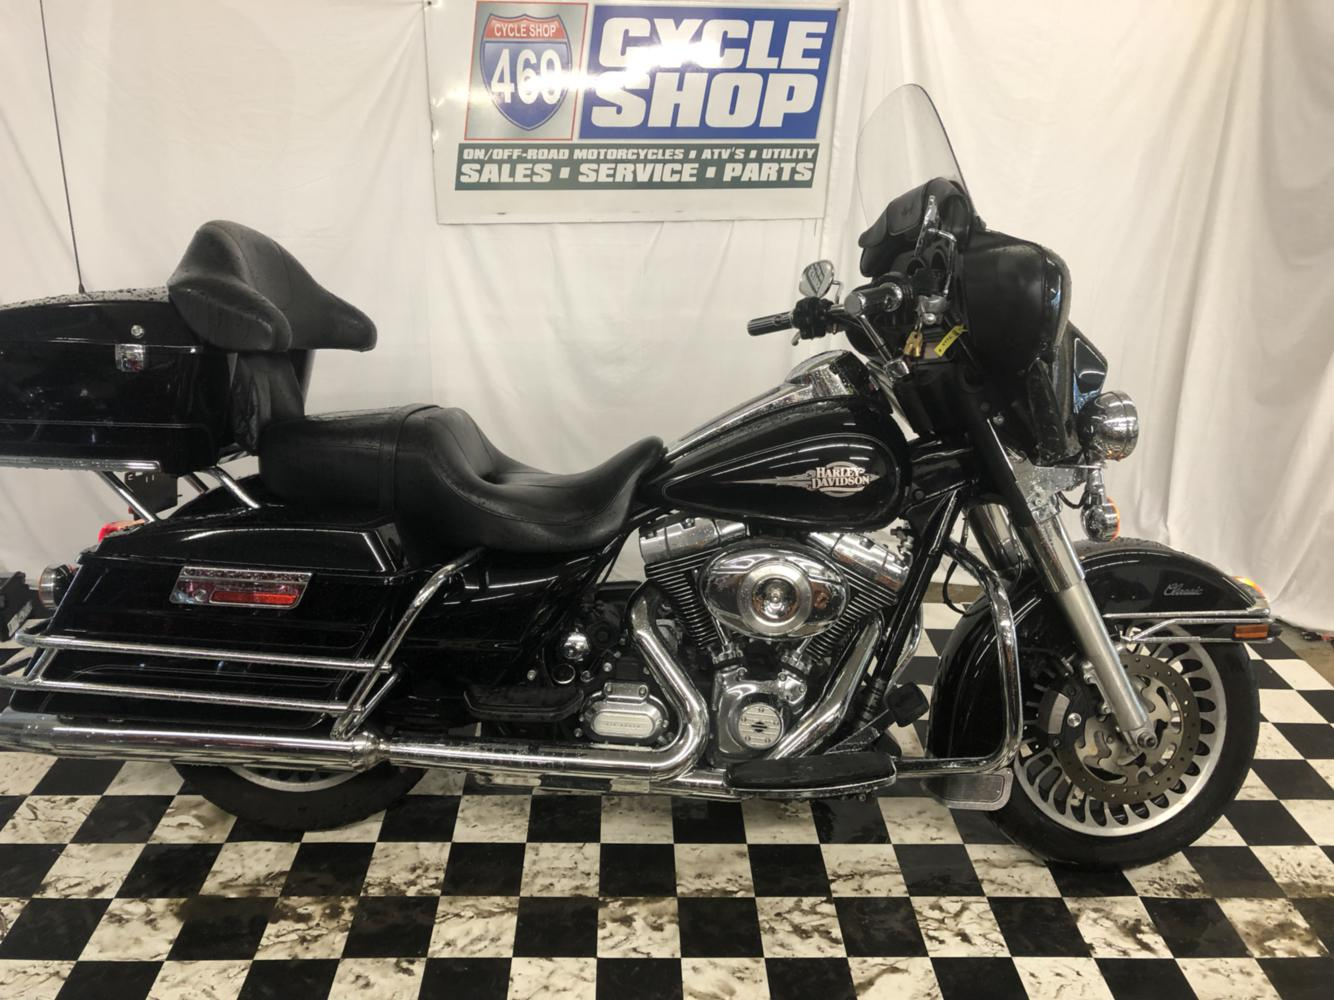 2012 Harley-Davidson® FLHTC ELECTRA GLIDE